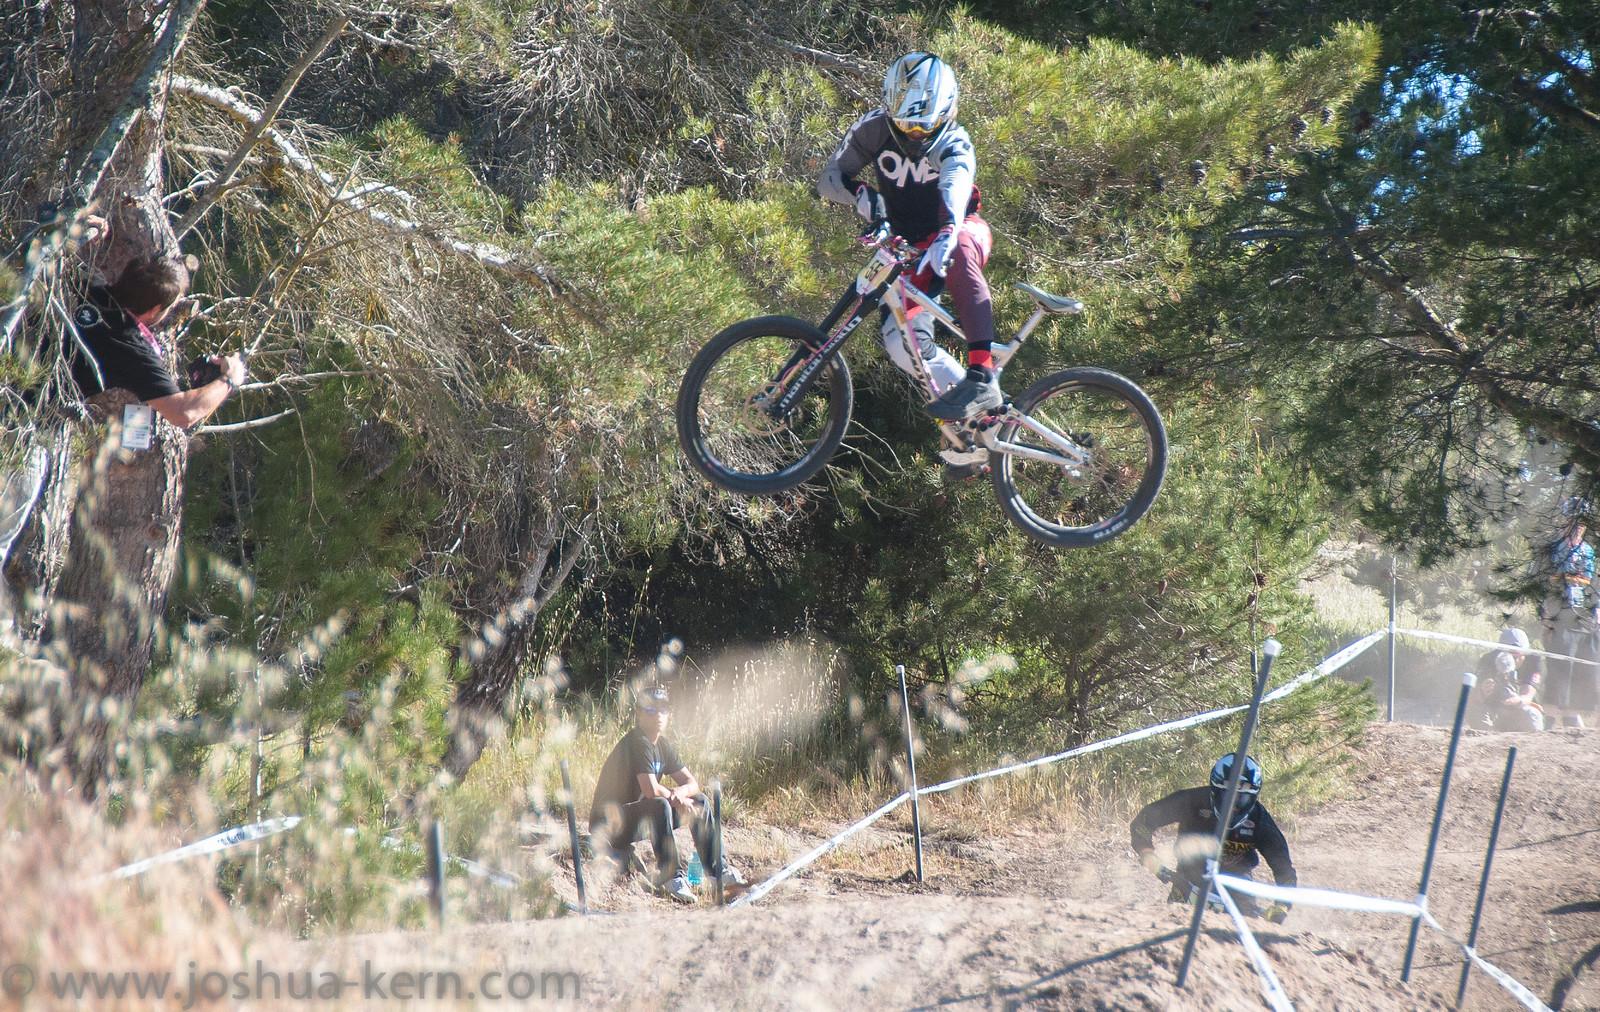 4-18-13DHPractice (3 of 17) - jkern620 - Mountain Biking Pictures - Vital MTB